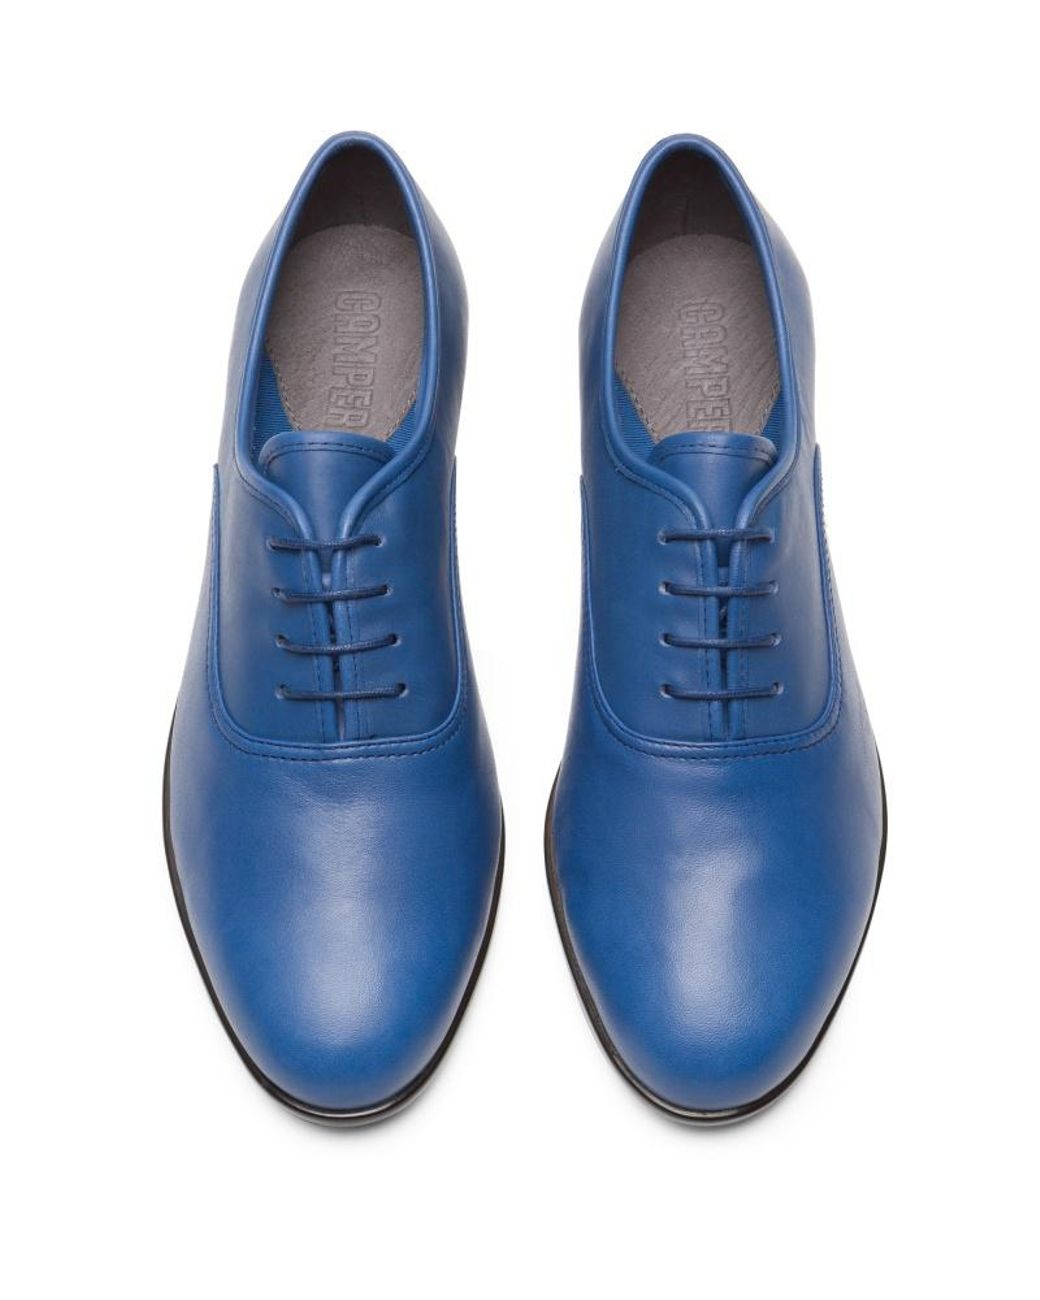 Women's Casual Jazz Blue Casi Shoes hdBtrsCoQx